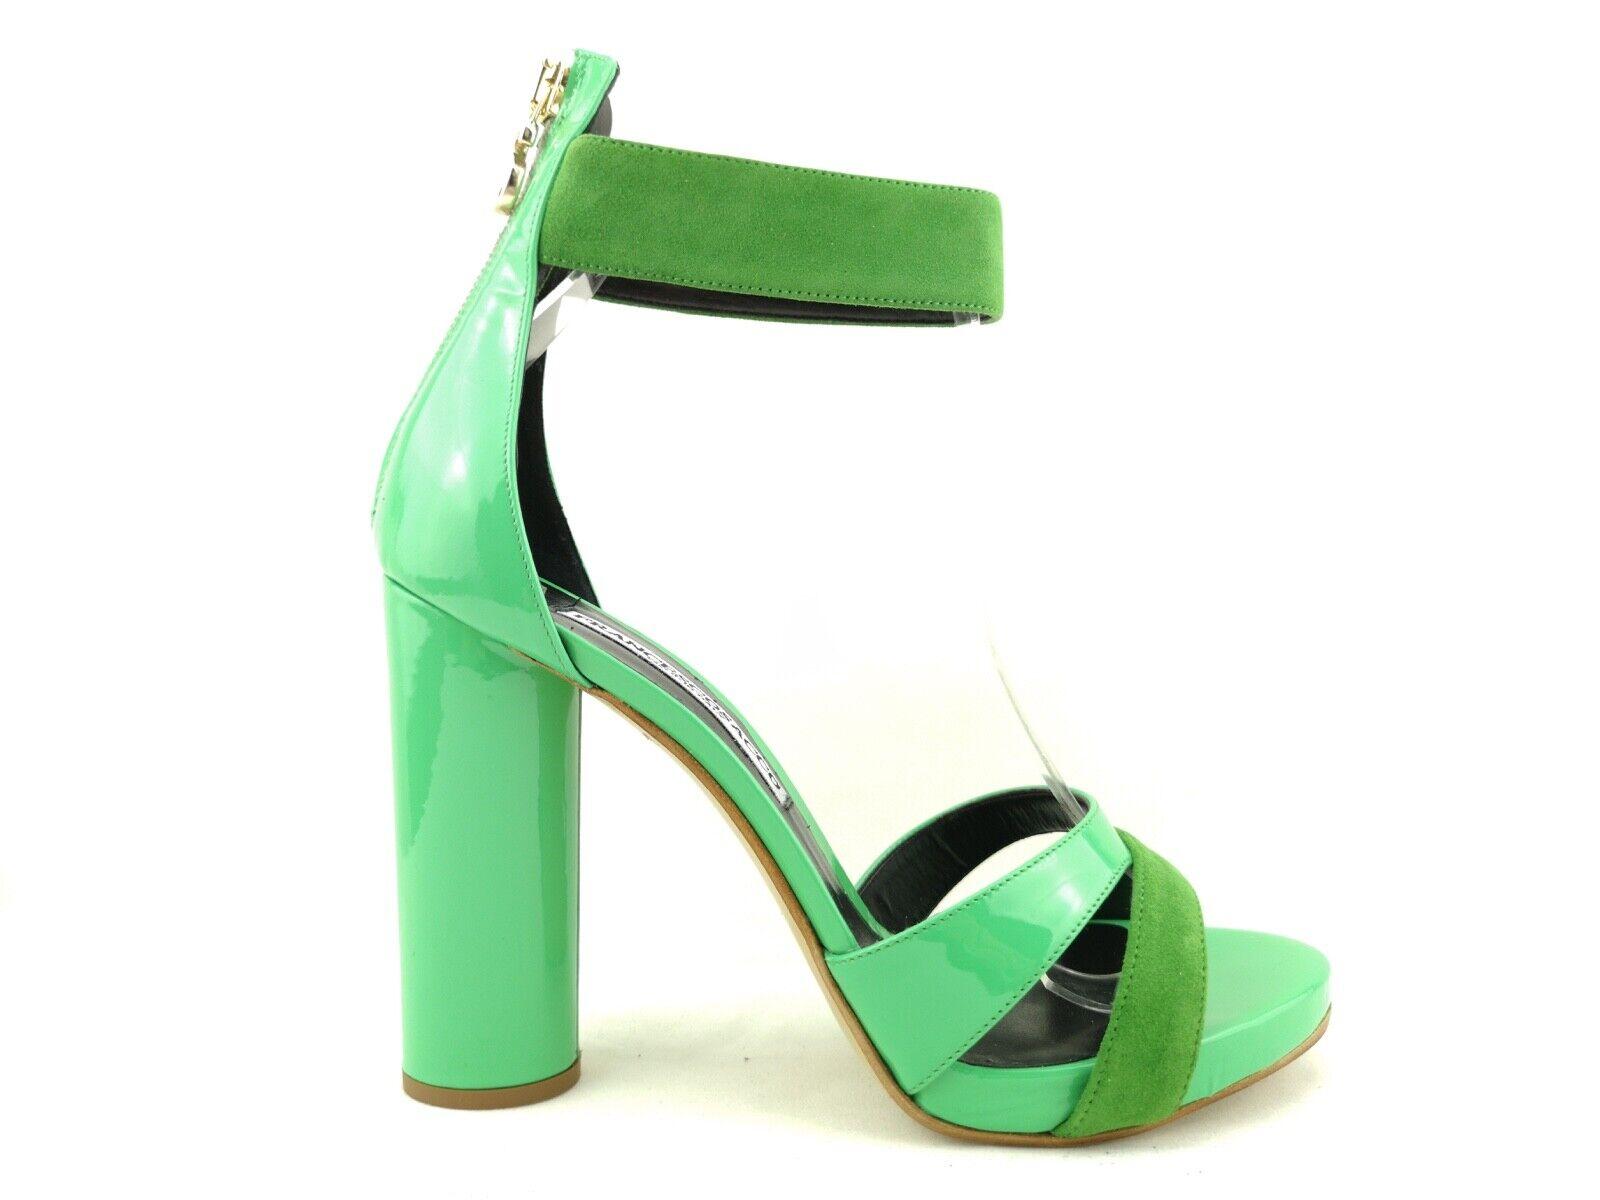 E19-FRS1 Chaussures Femme 39 Escarpins Sandale Francesco Sac Vert Cuir Made